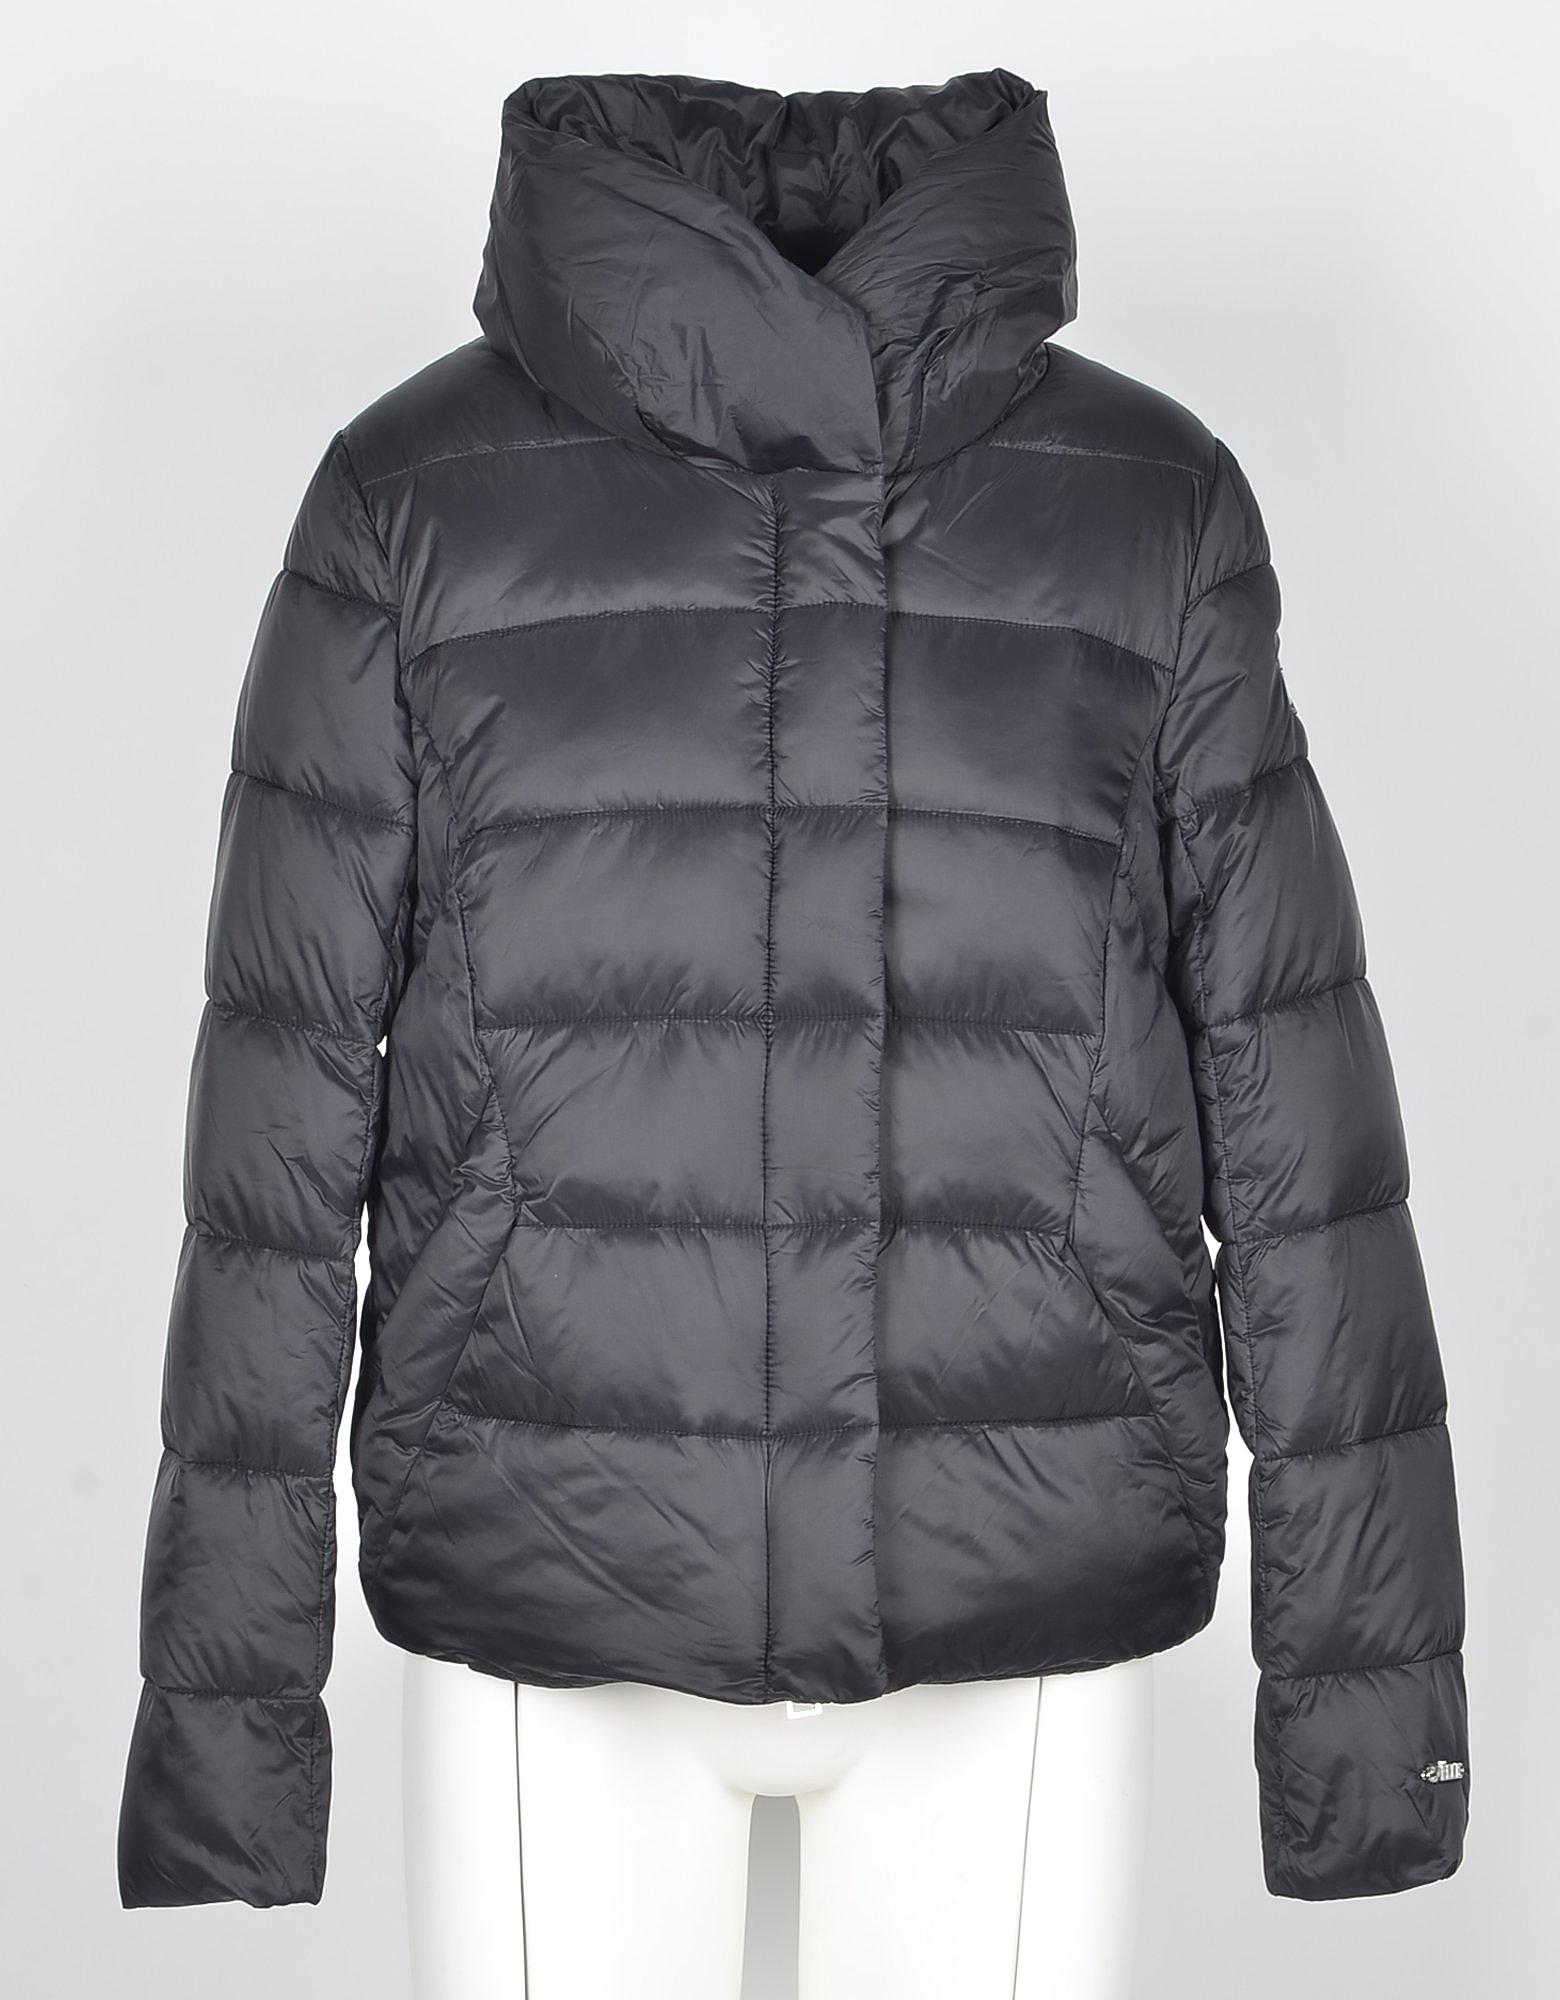 GAELLE PARIS Designer Coats & Jackets, Women's Black Padded Jacket